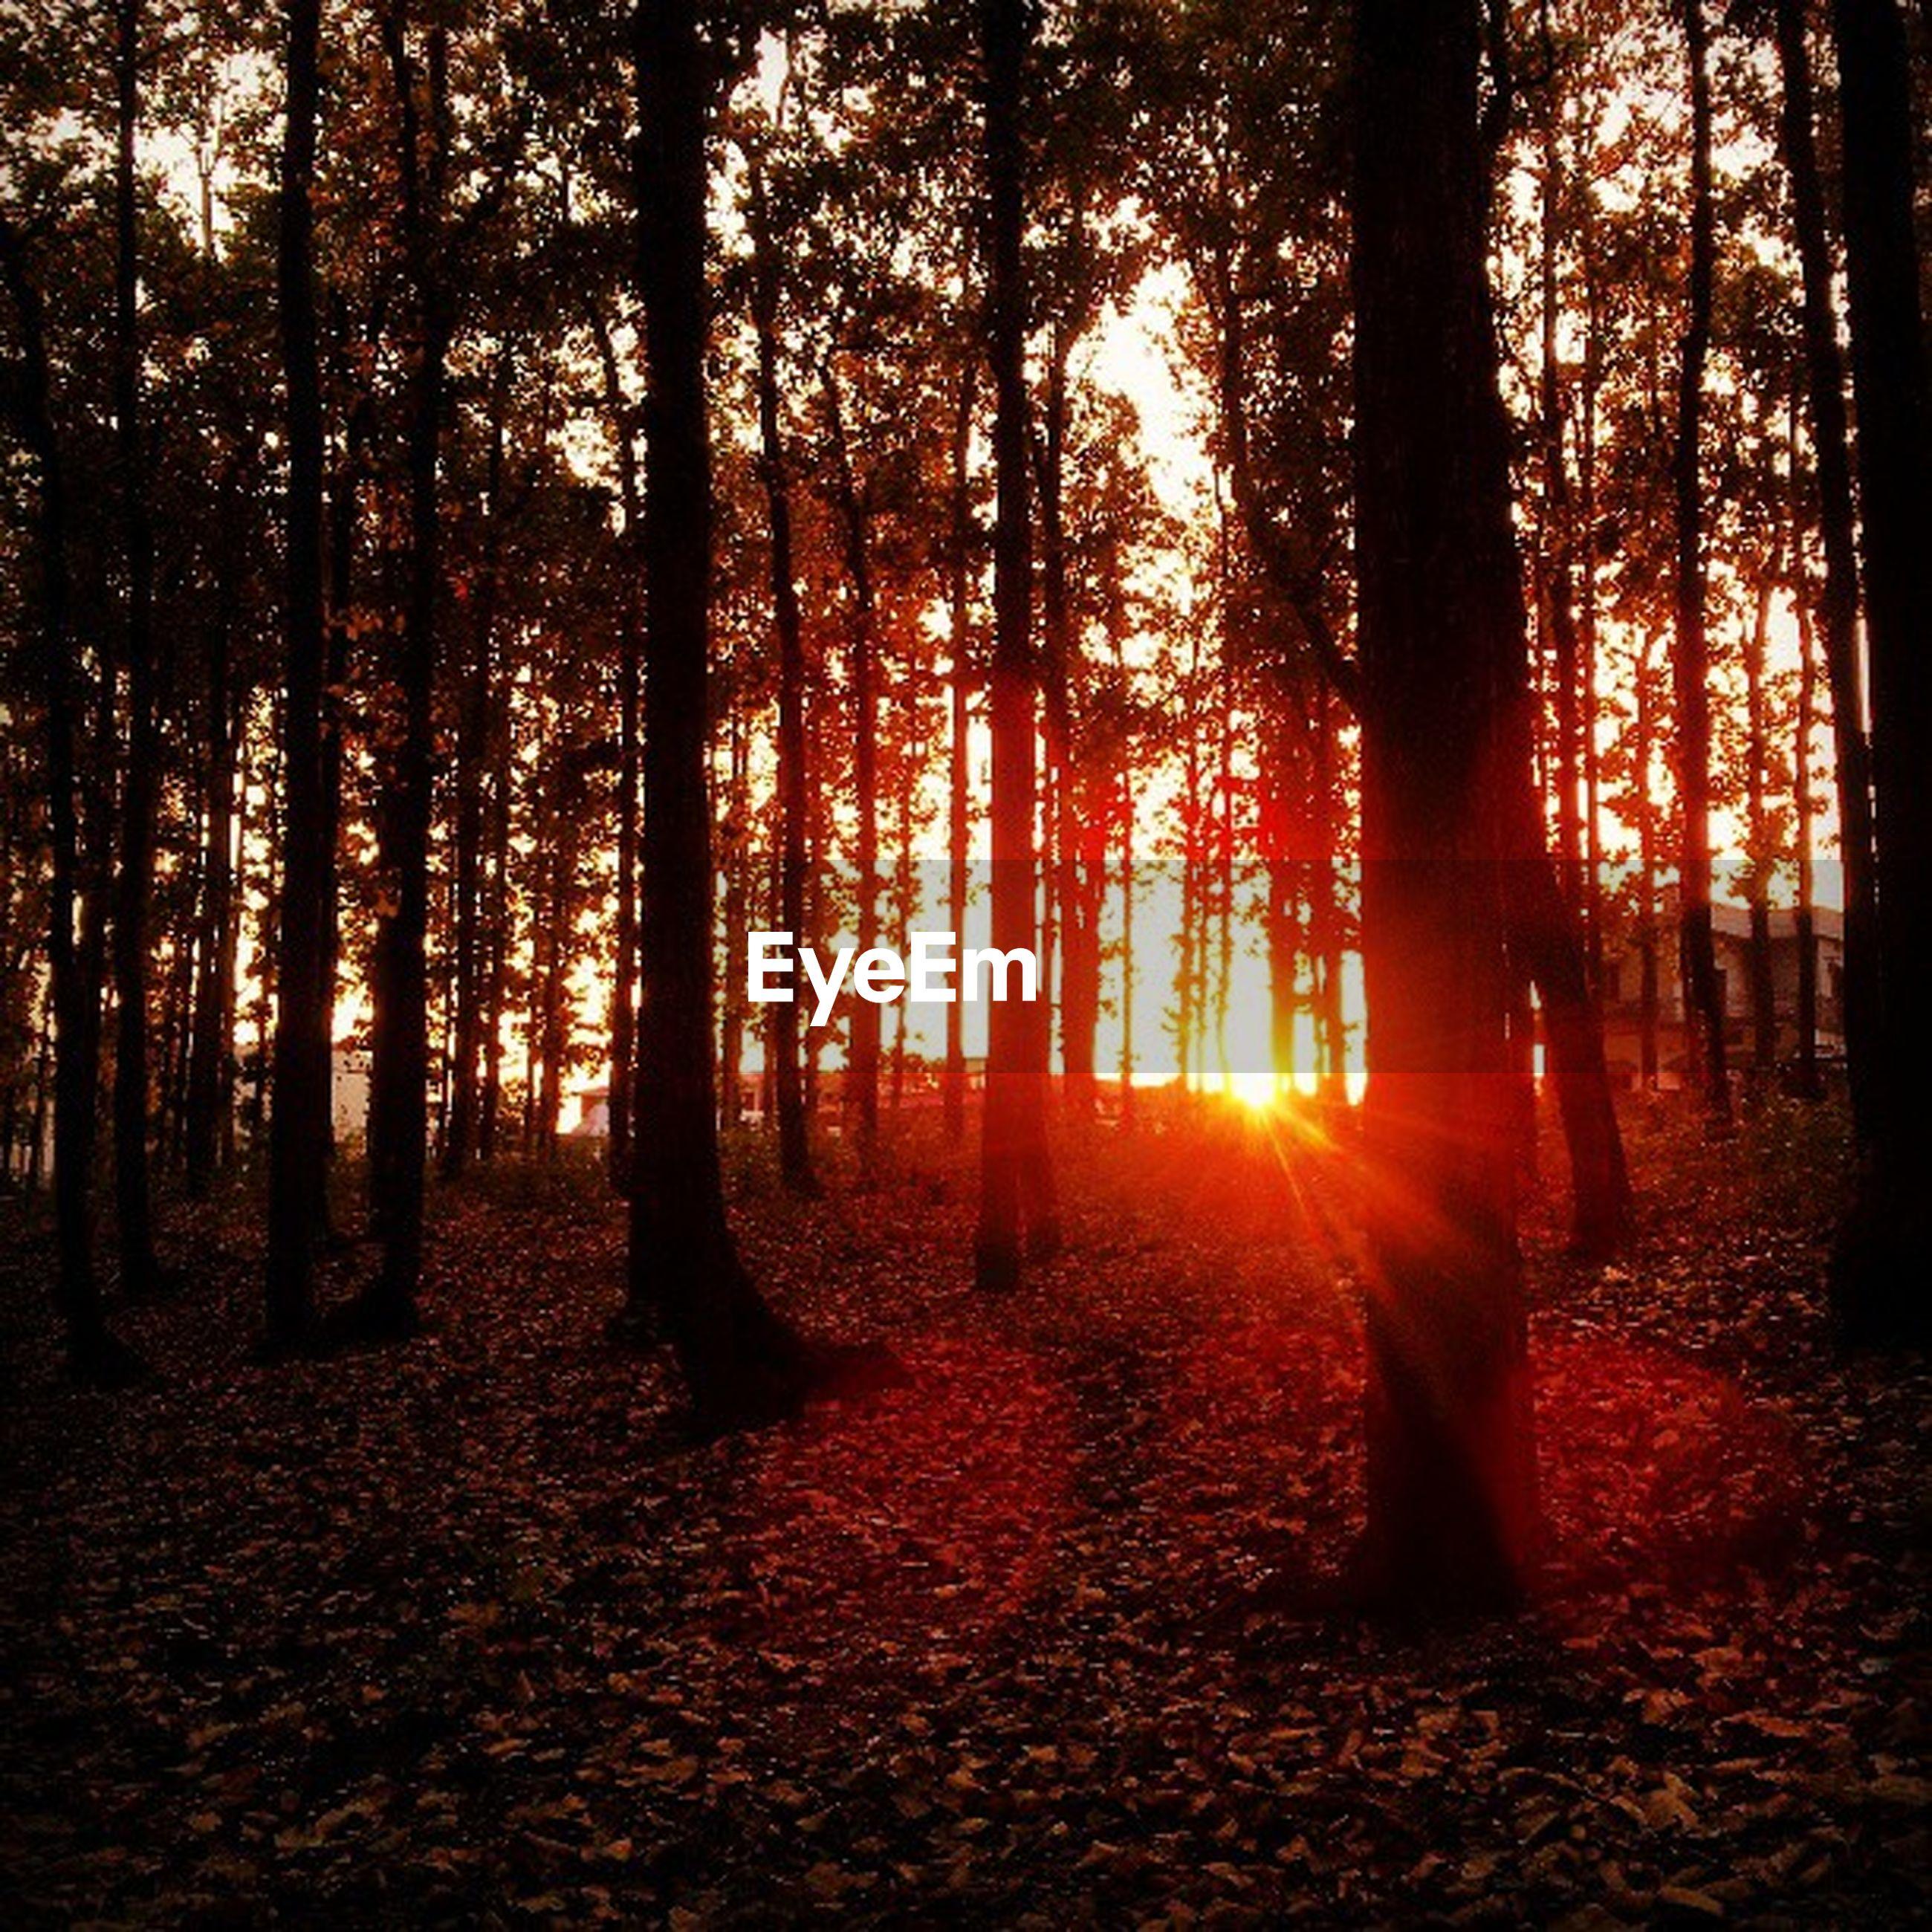 tree, forest, tranquility, tranquil scene, nature, tree trunk, orange color, beauty in nature, scenics, sunlight, woodland, growth, sunset, autumn, sun, sunbeam, non-urban scene, landscape, idyllic, change